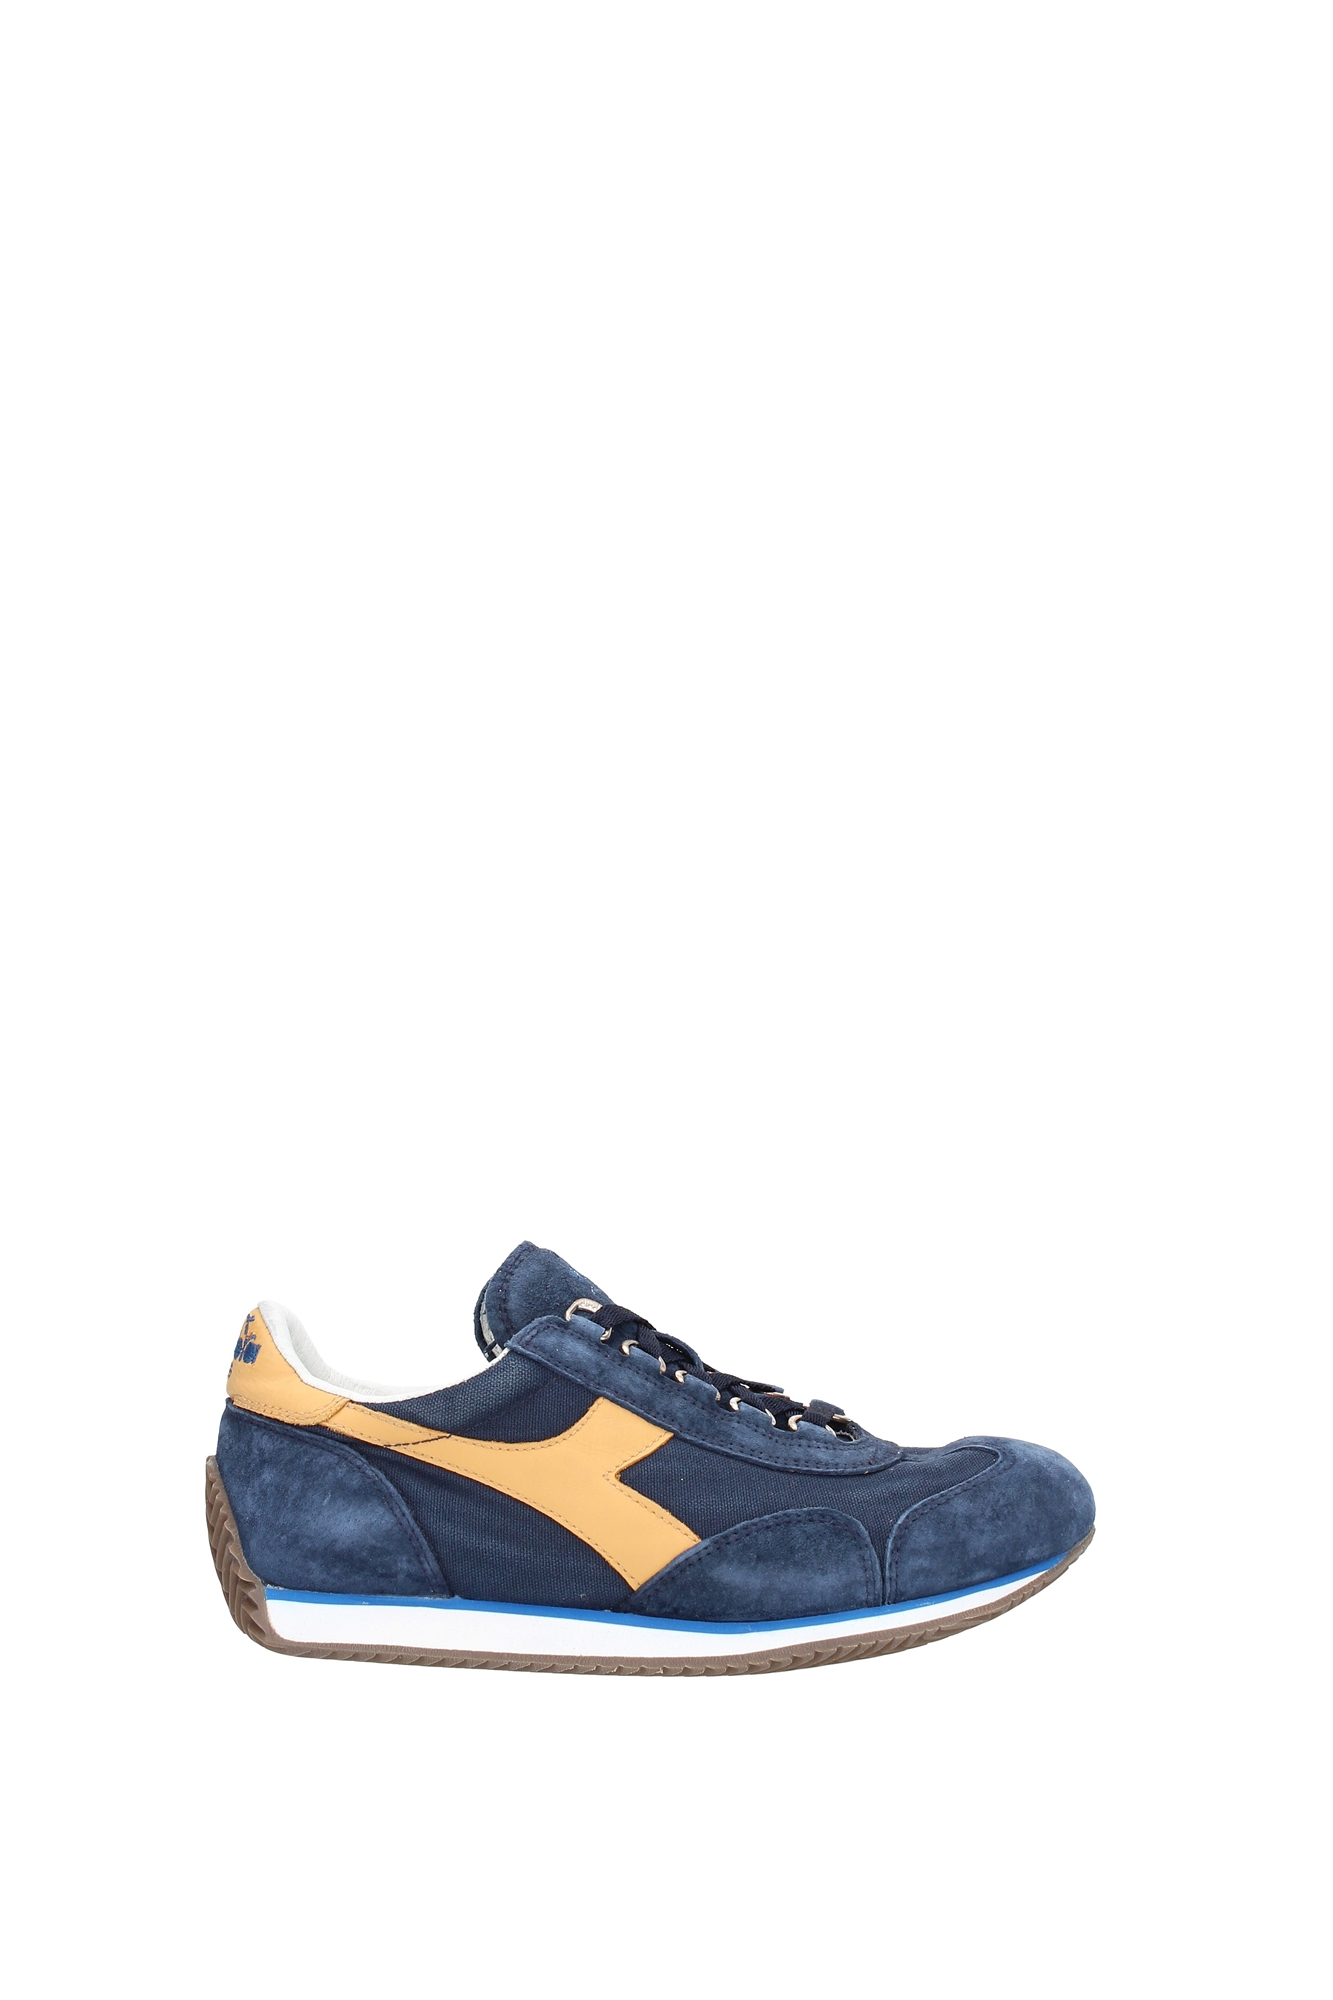 Sneakers-Diadora-Heritage-Women-Fabric-201156988C6146